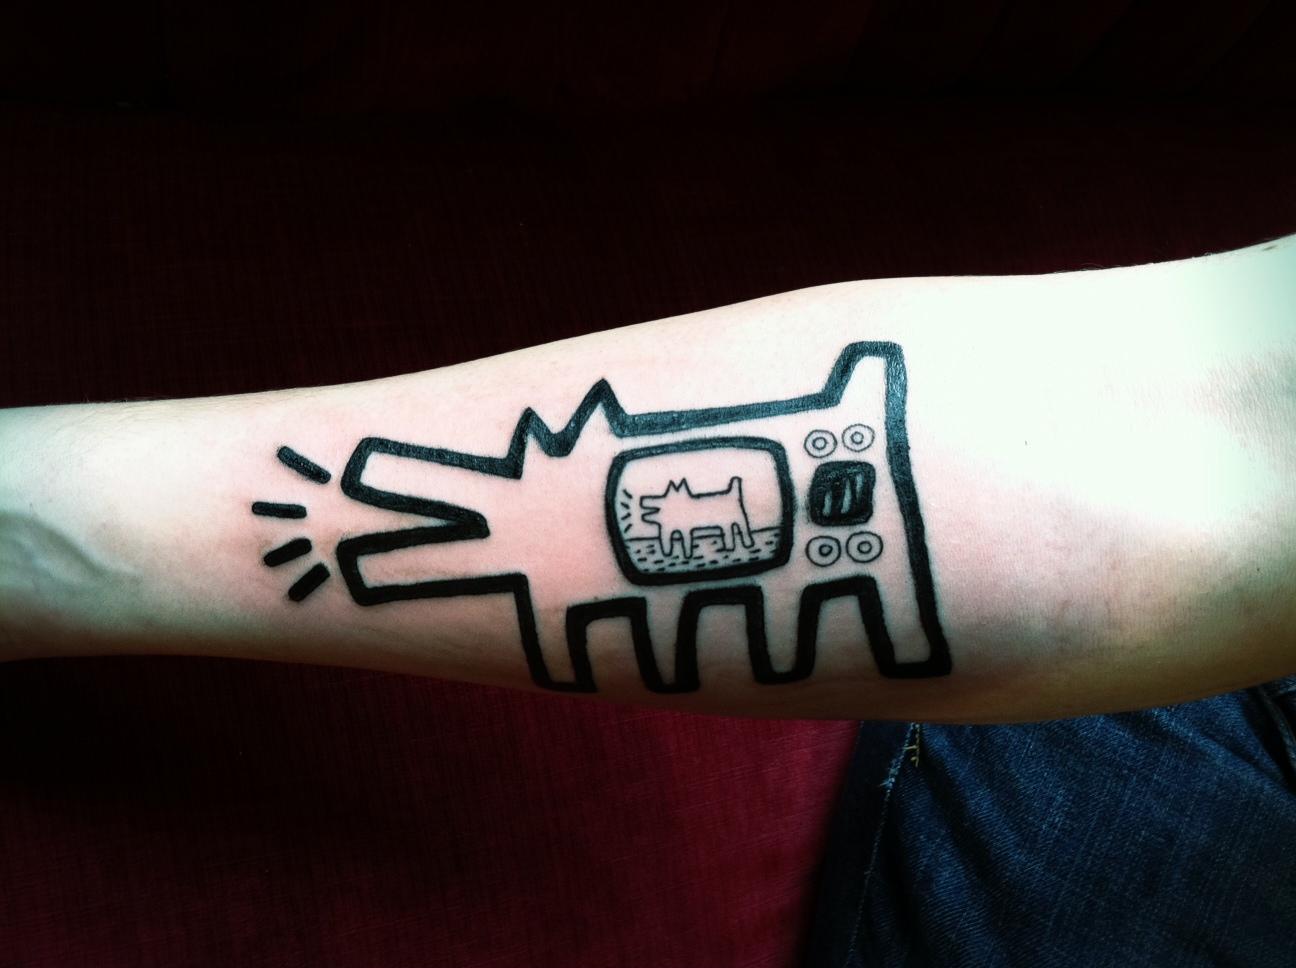 Pop-art-tattoo-barking-dog-tv-inspired-by-keith-haring.jpeg